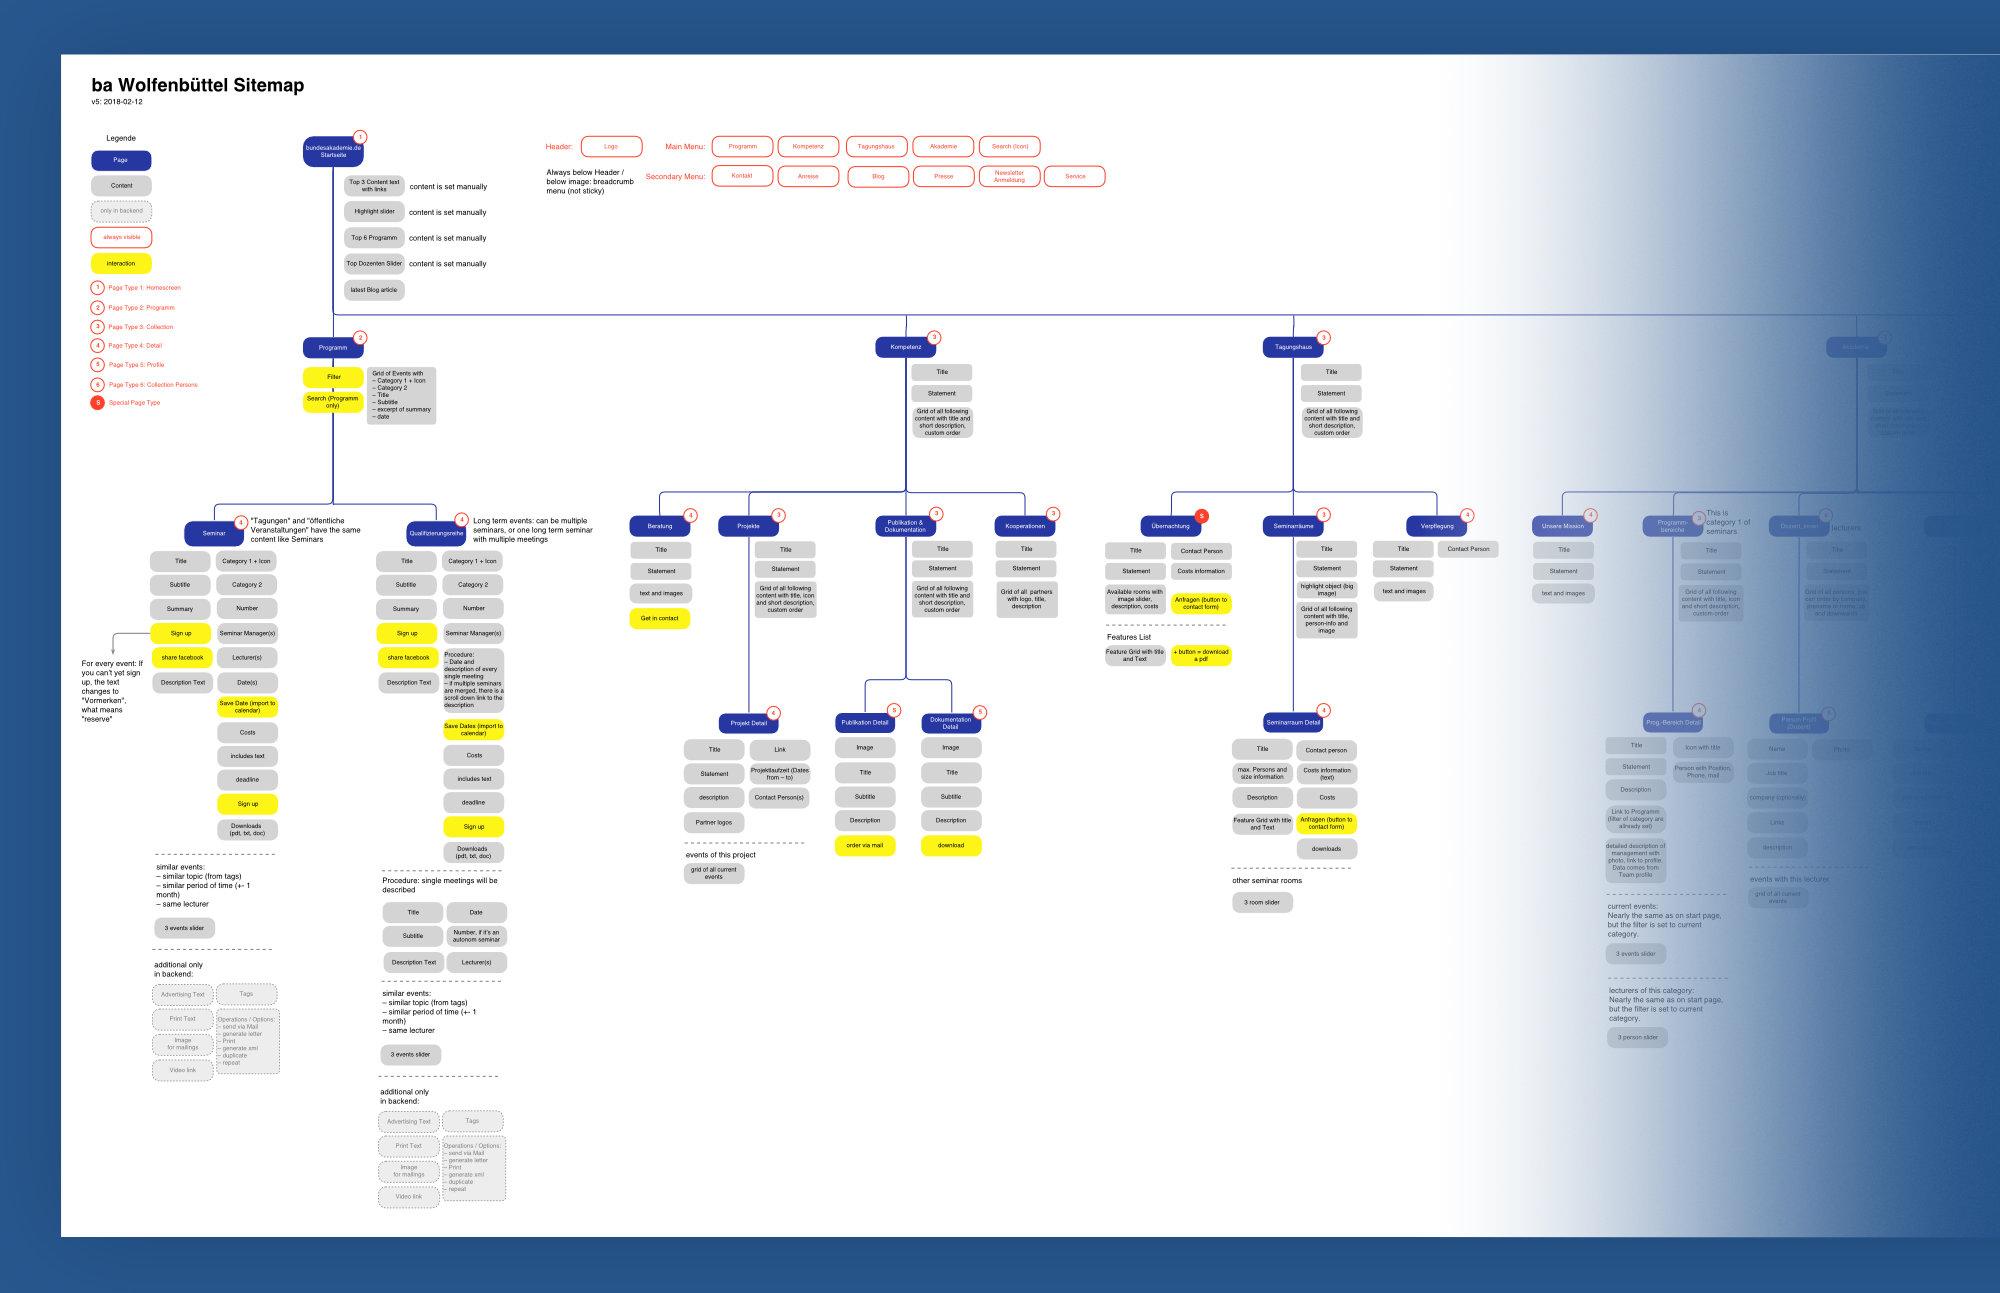 UX / UI Website Design Potsdam Bundesakademie Wolfenbuettel Sitemap